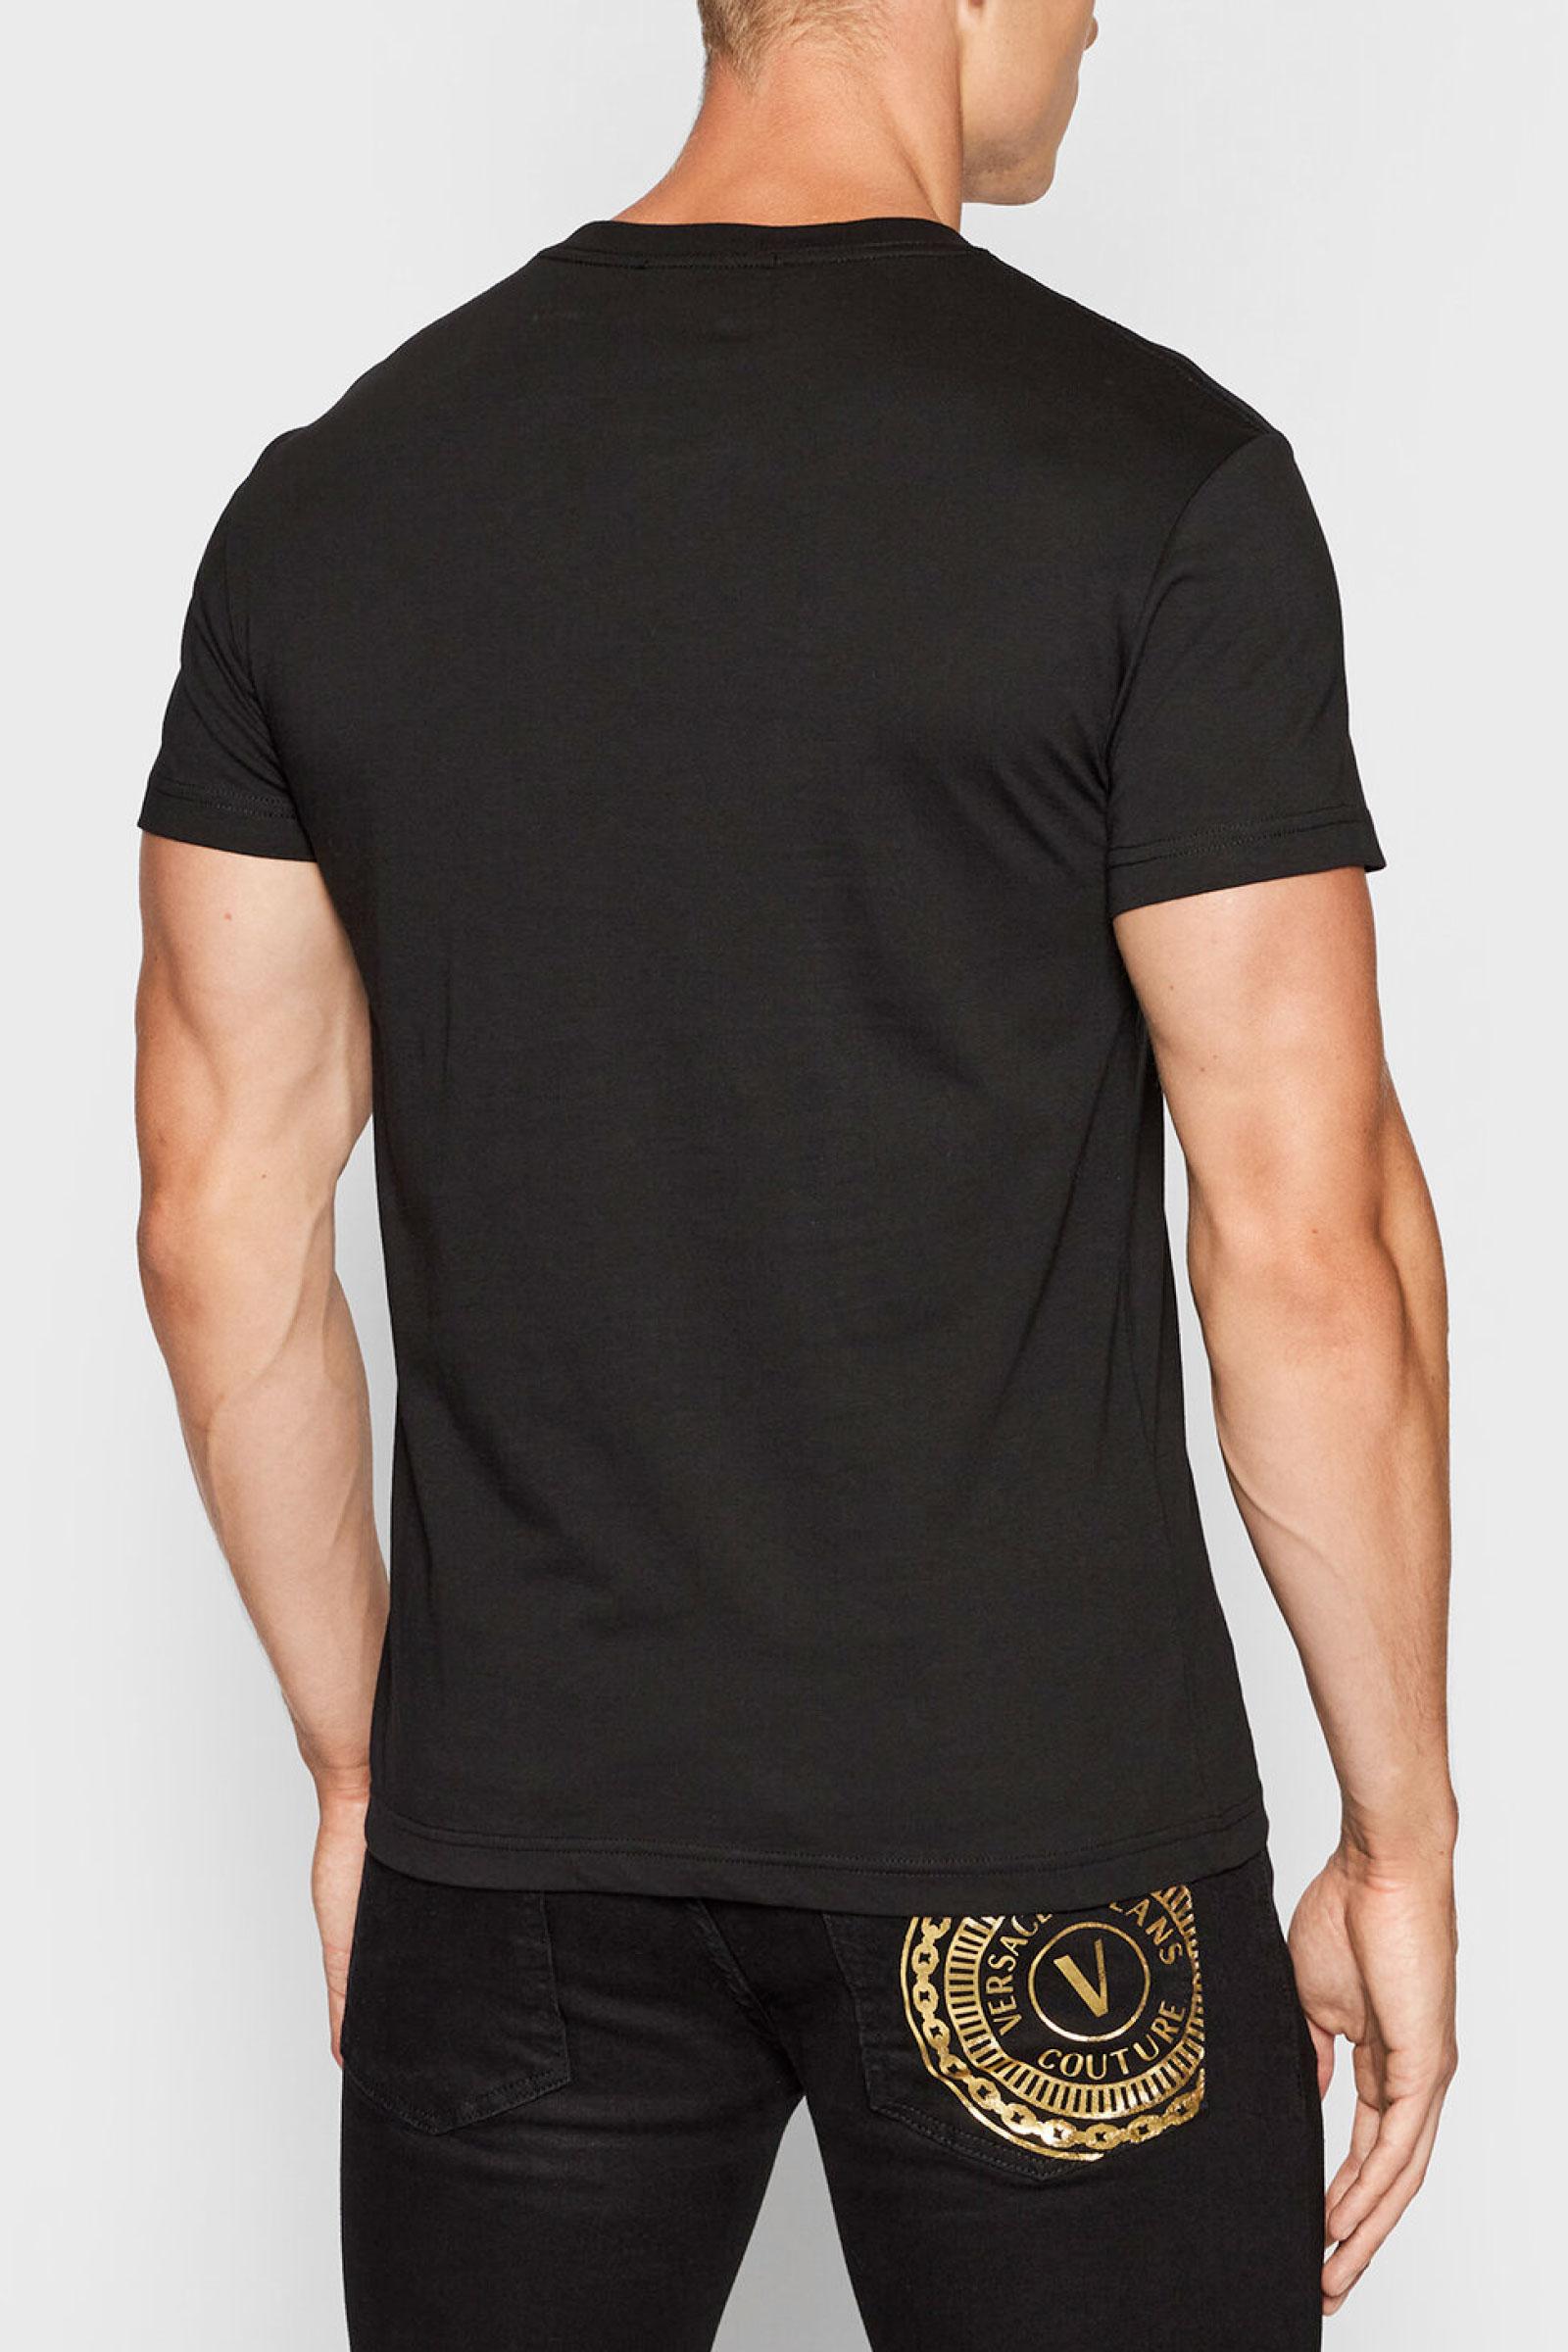 VERSACE JEANS COUTURE | T-Shirt | 71GAHF05 CJ00FG89